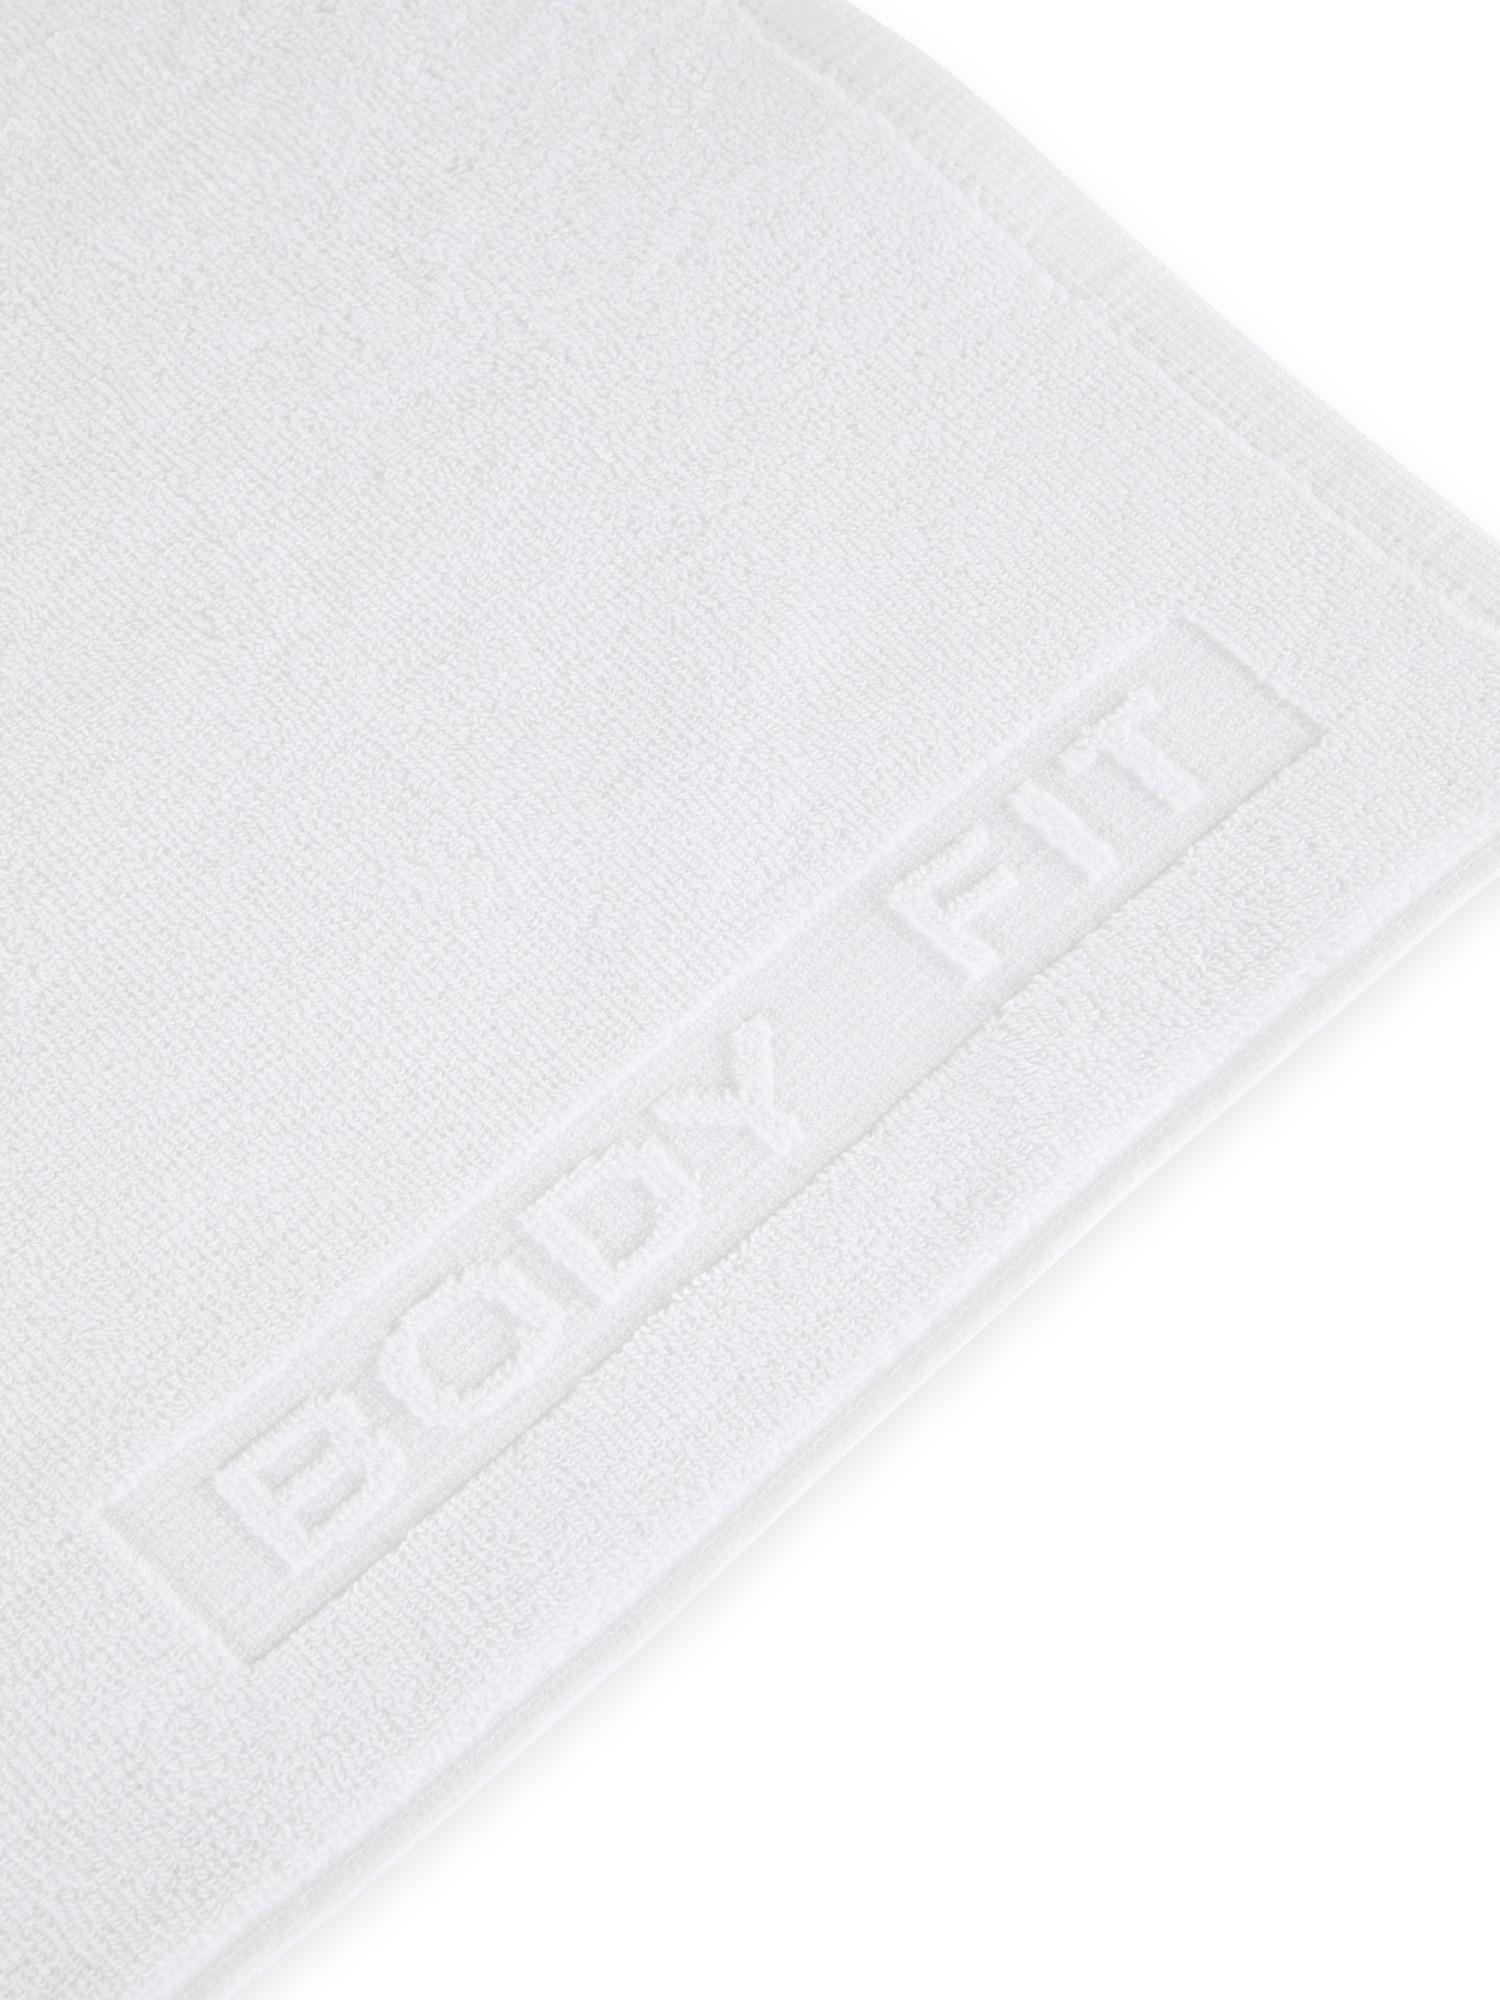 Asciugamano capelli spugna di cotone tinta unita, Bianco, large image number 2